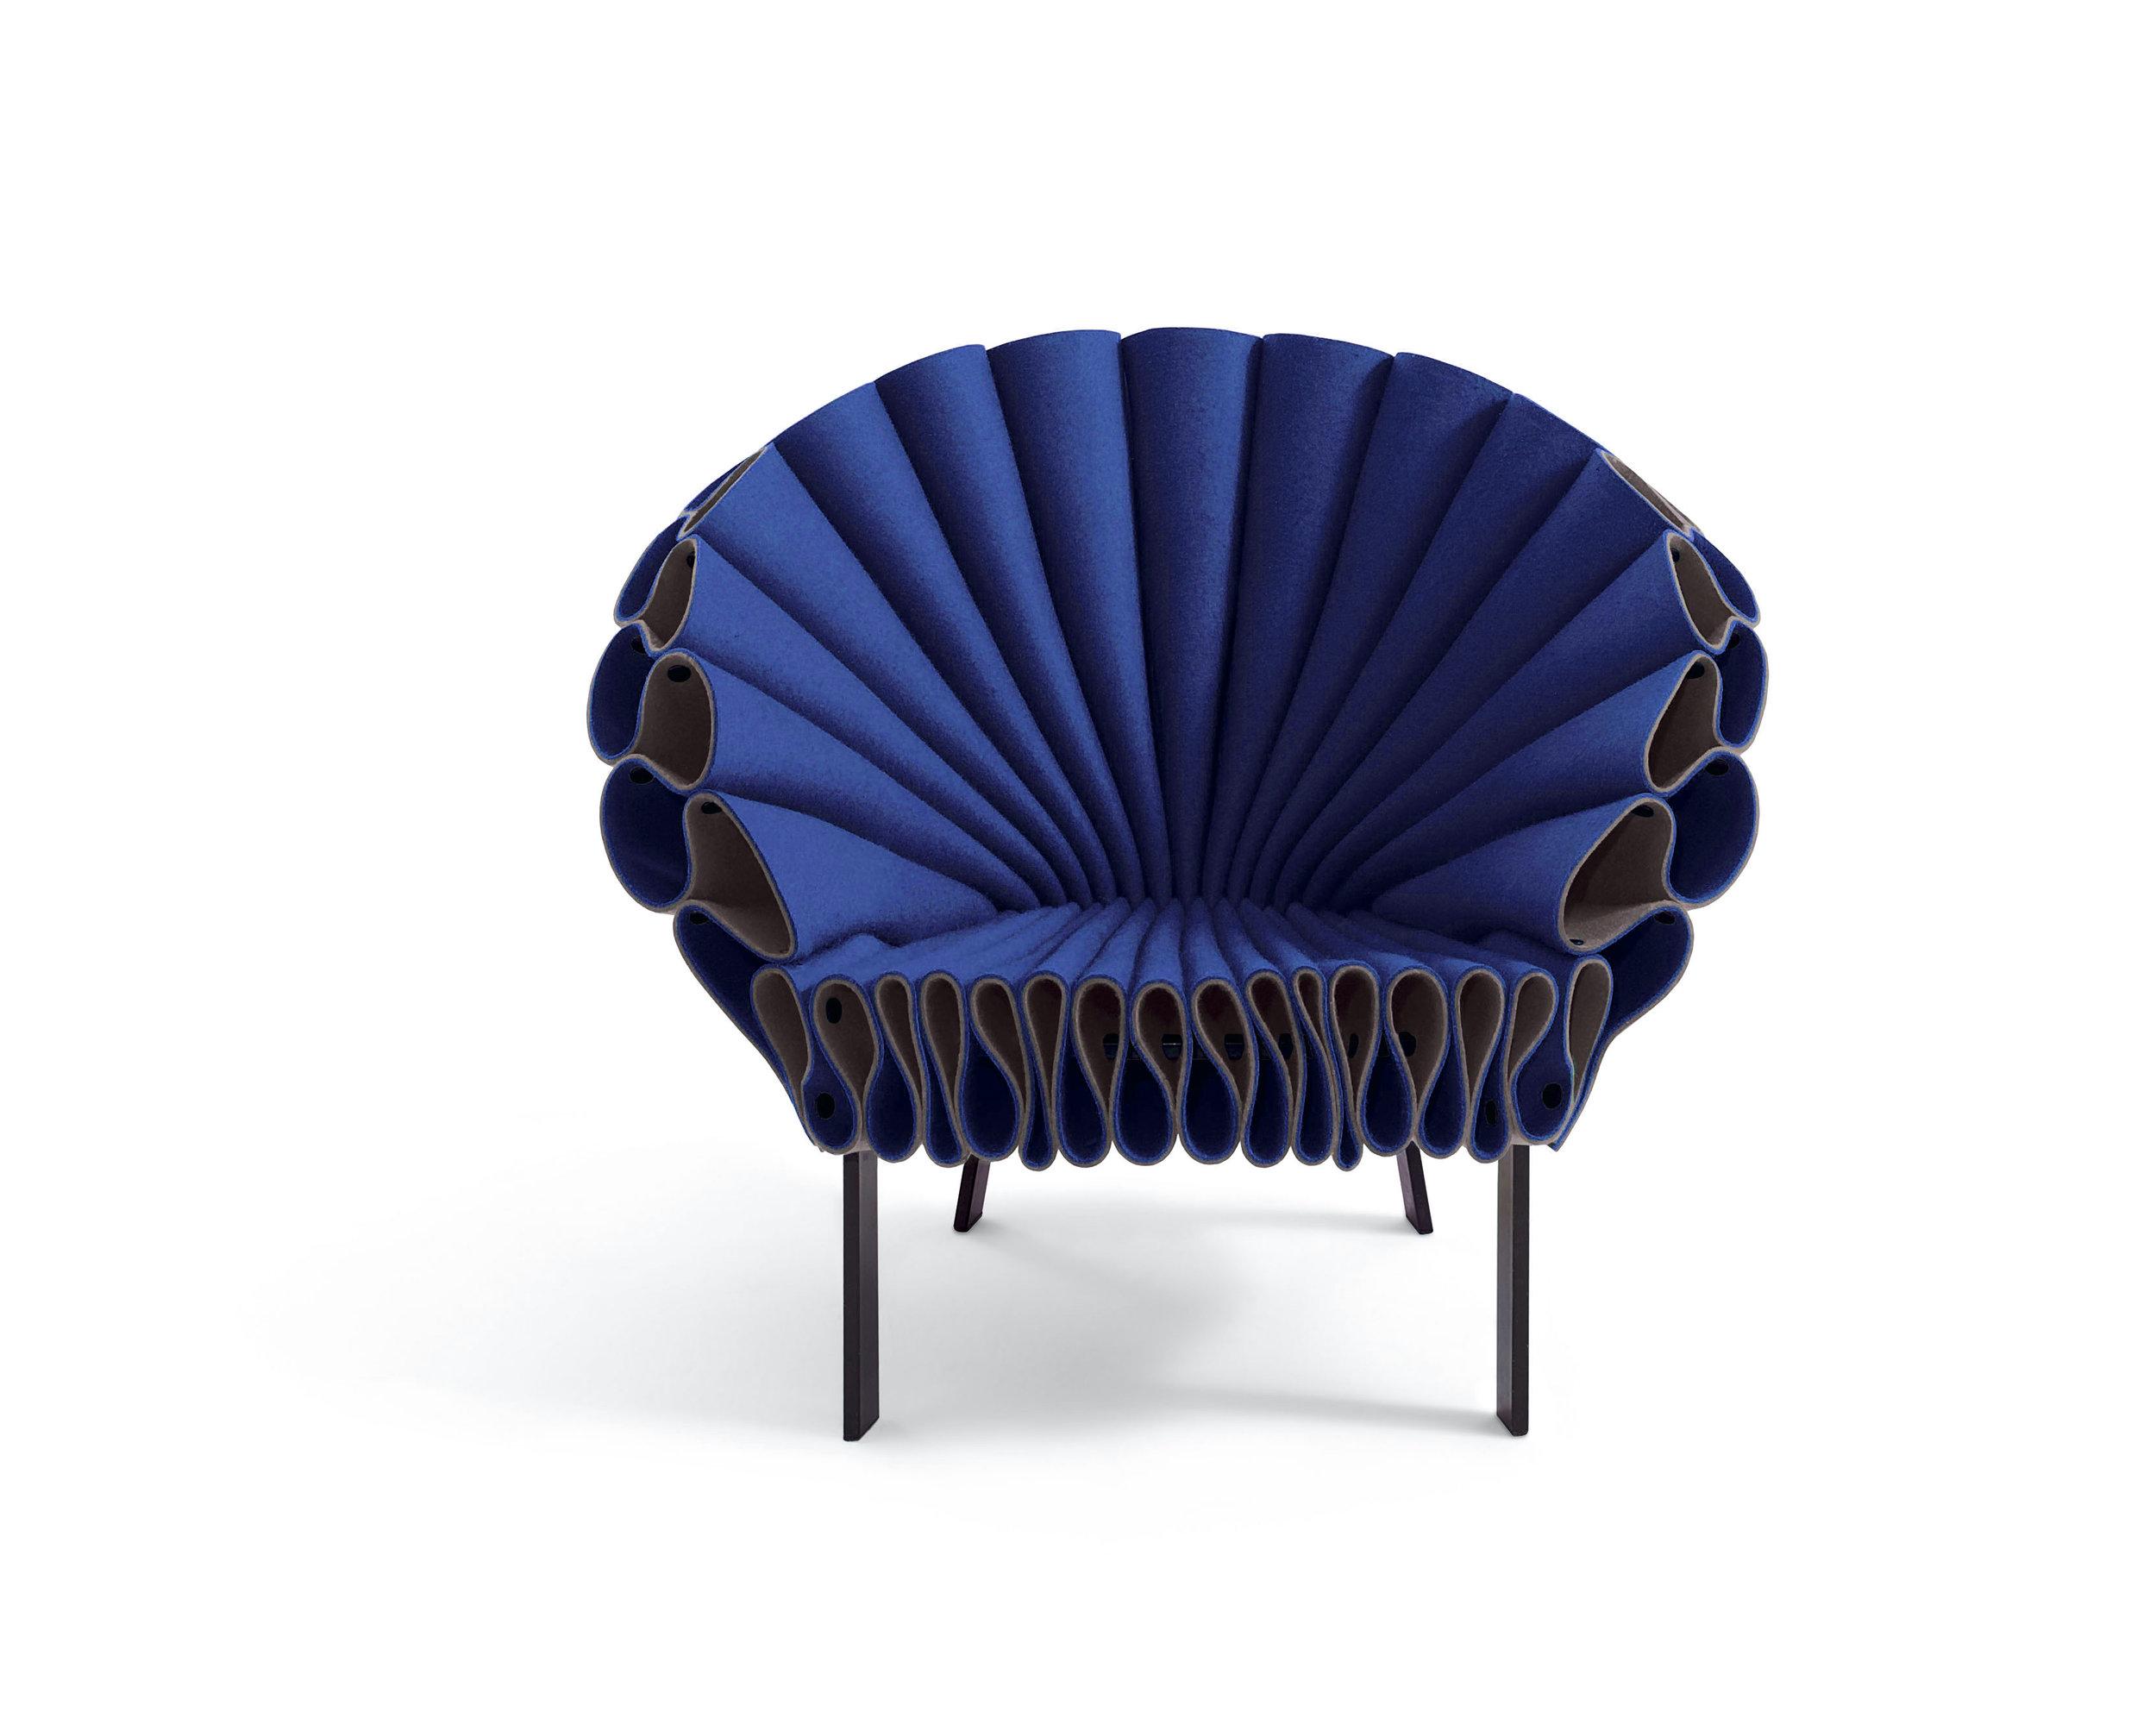 Dror-Peacock-Chair_for_Cappellini.jpg